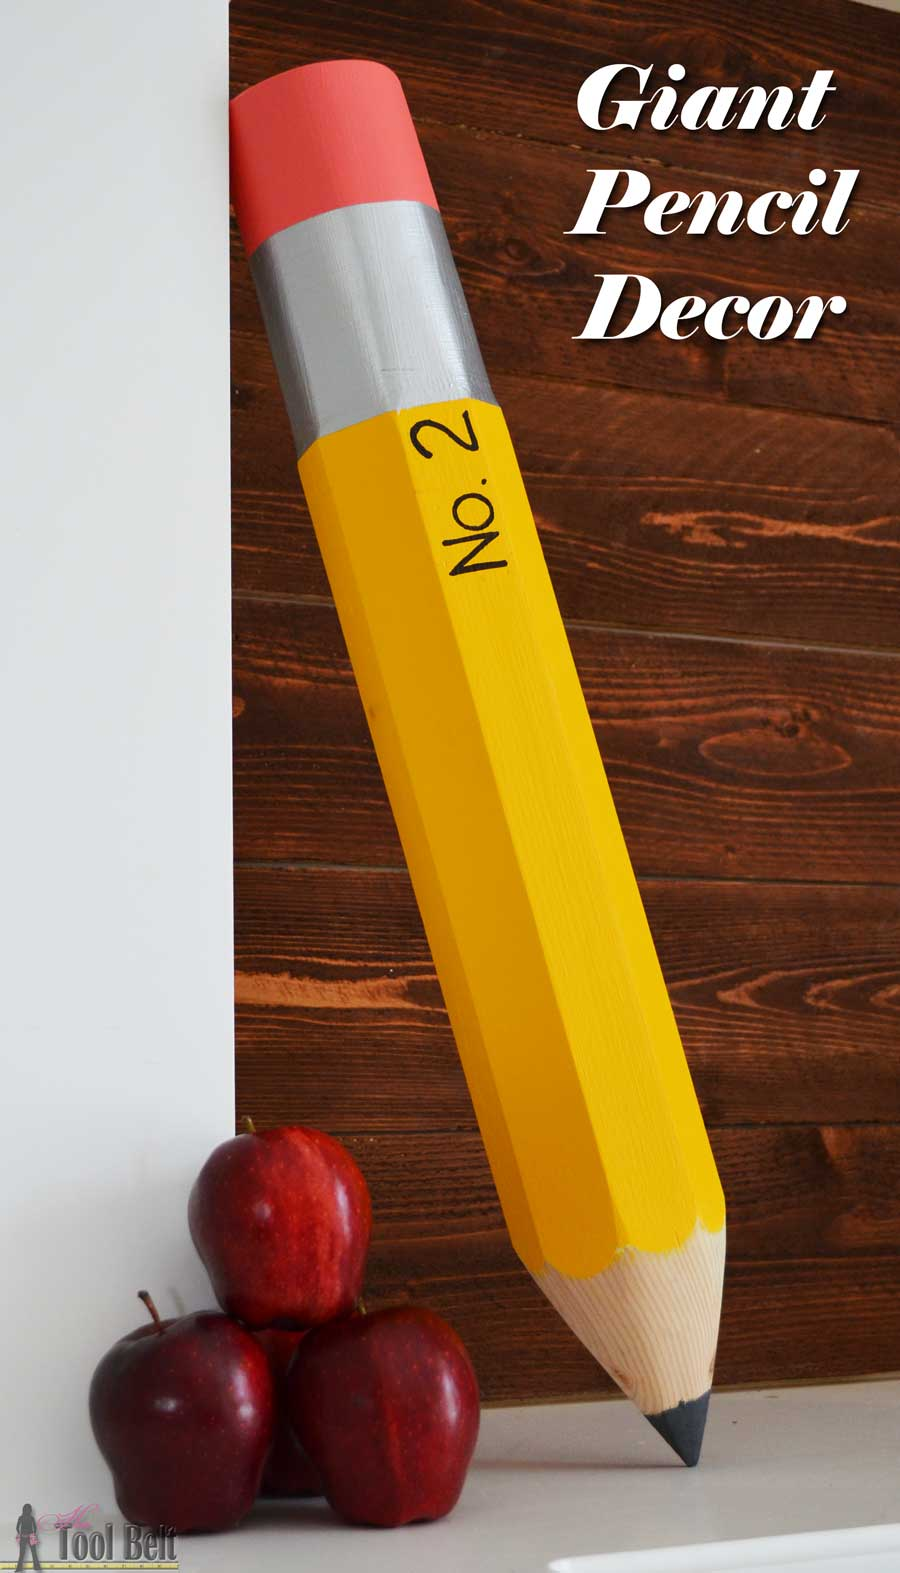 Classroom Decor Black ~ Giant pencil decoration her tool belt